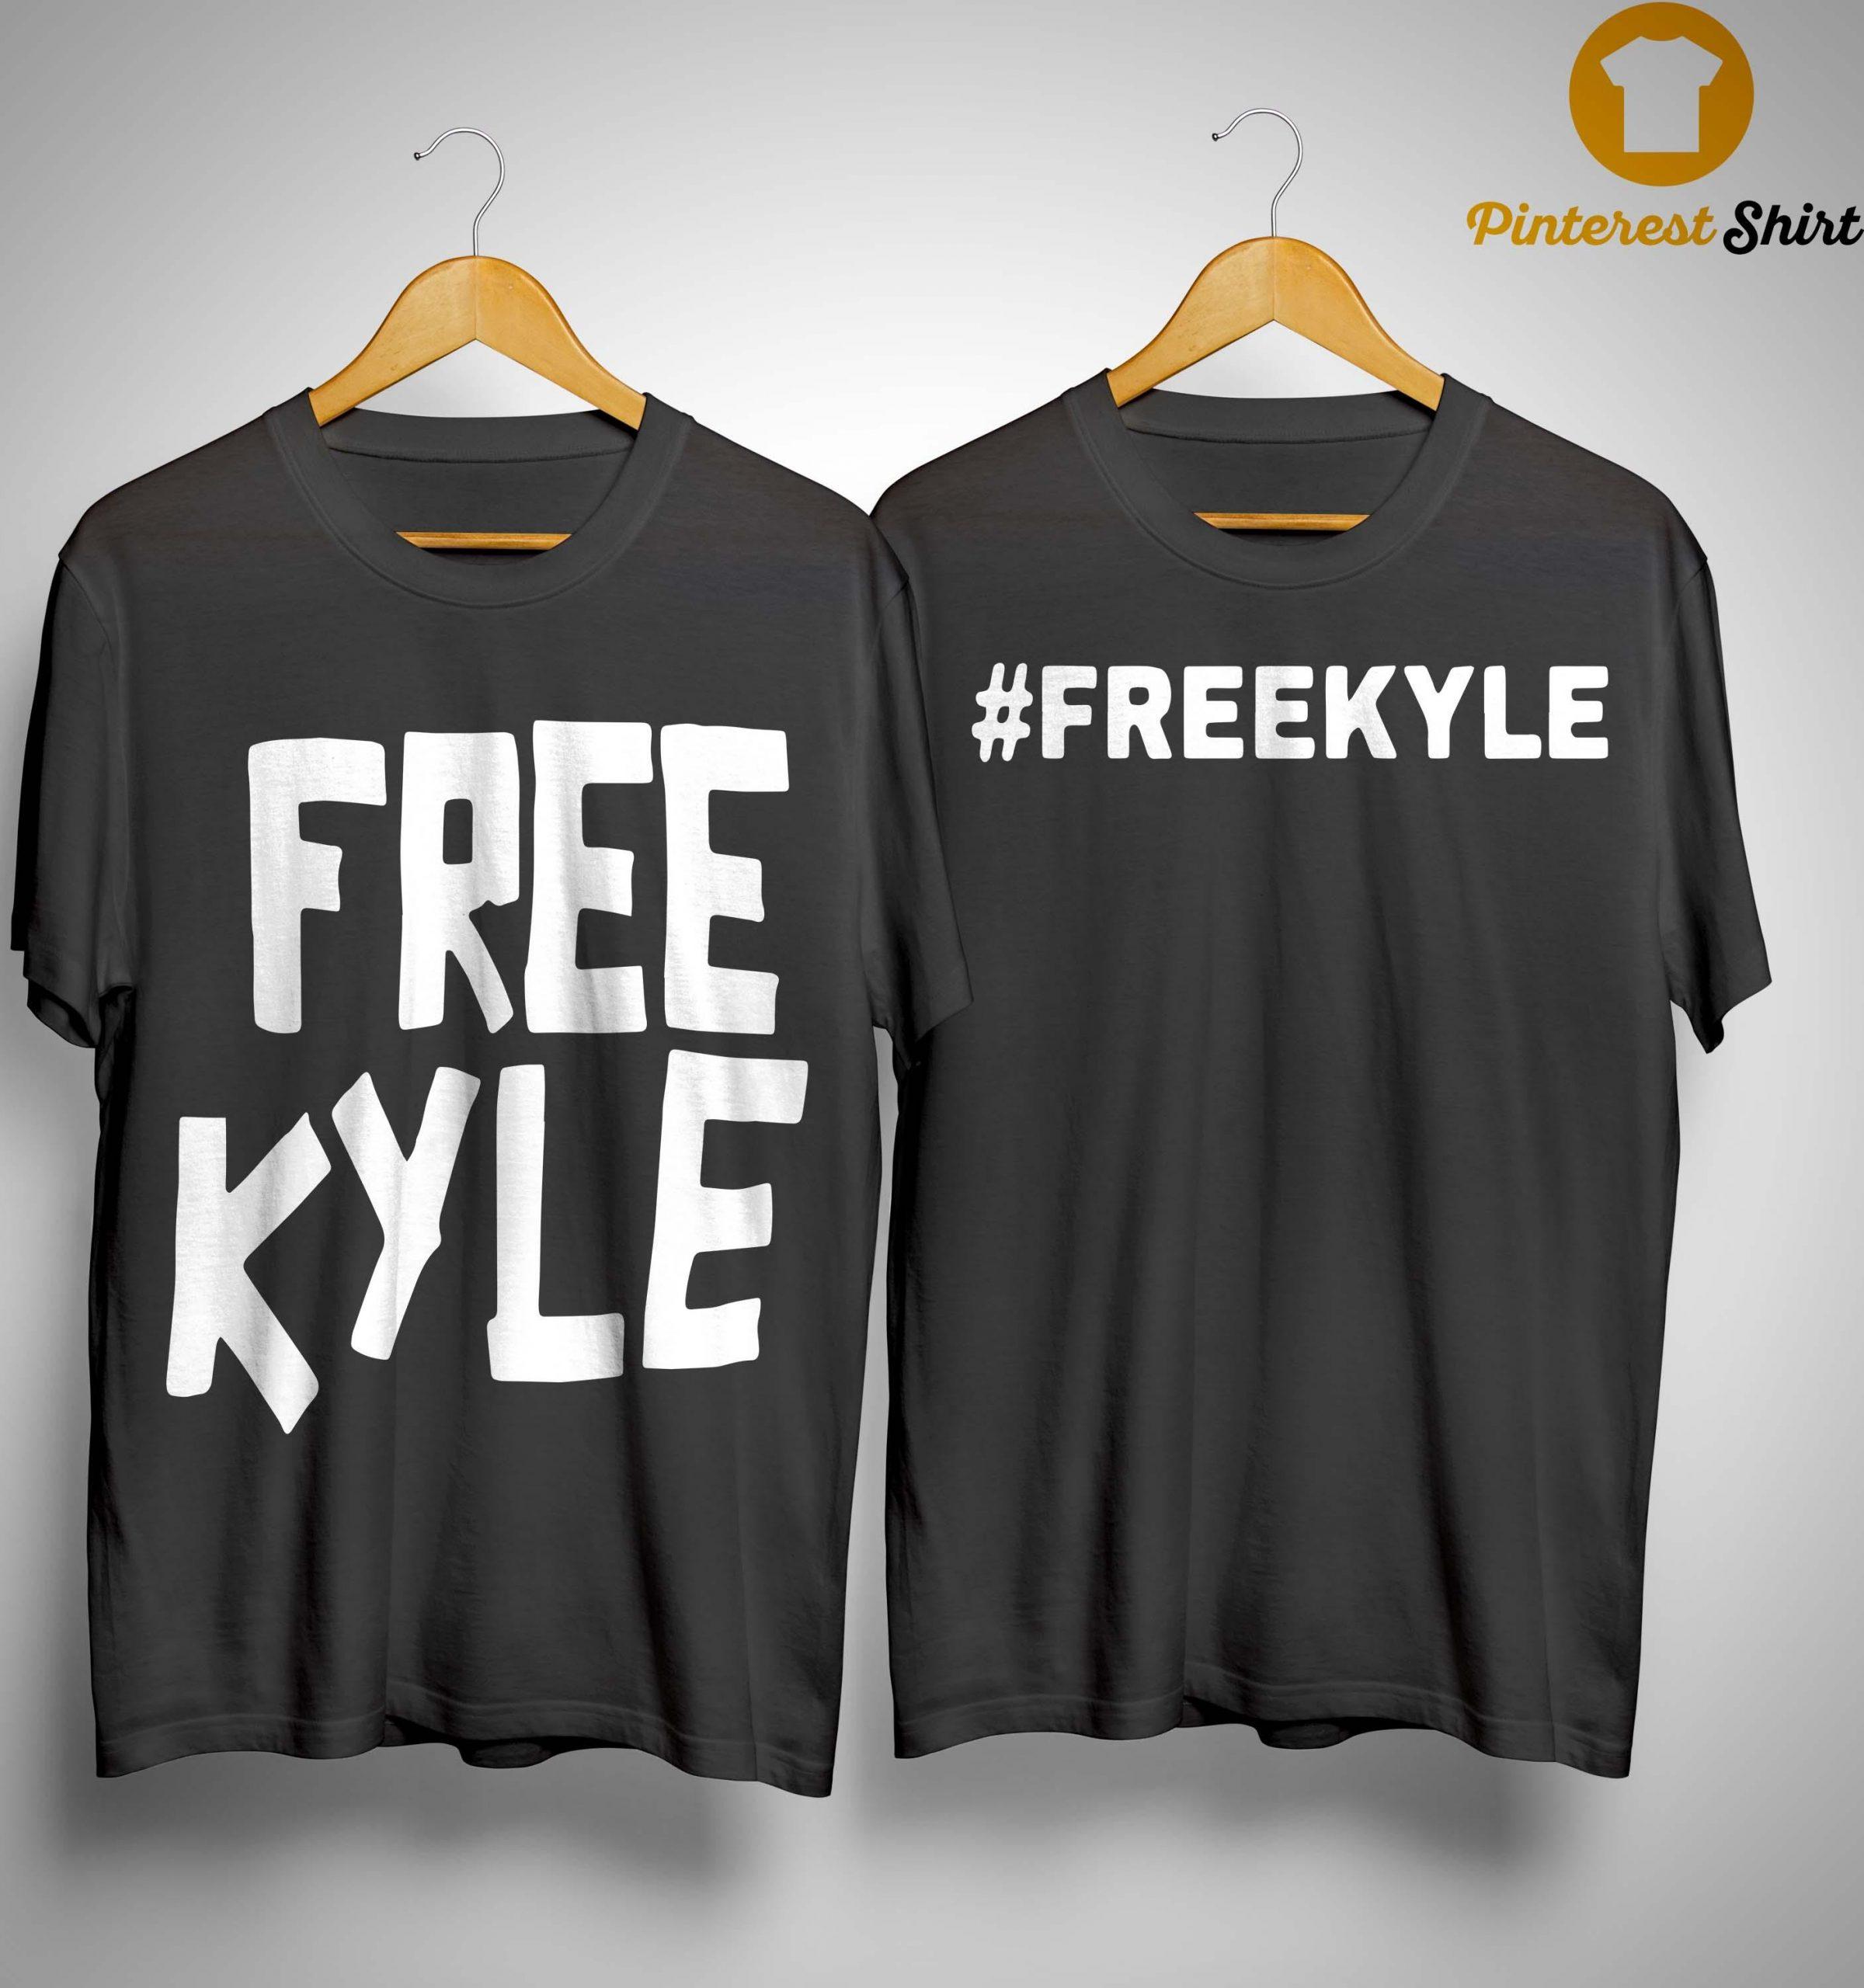 Sleeping Giants Free Kyle Shirt